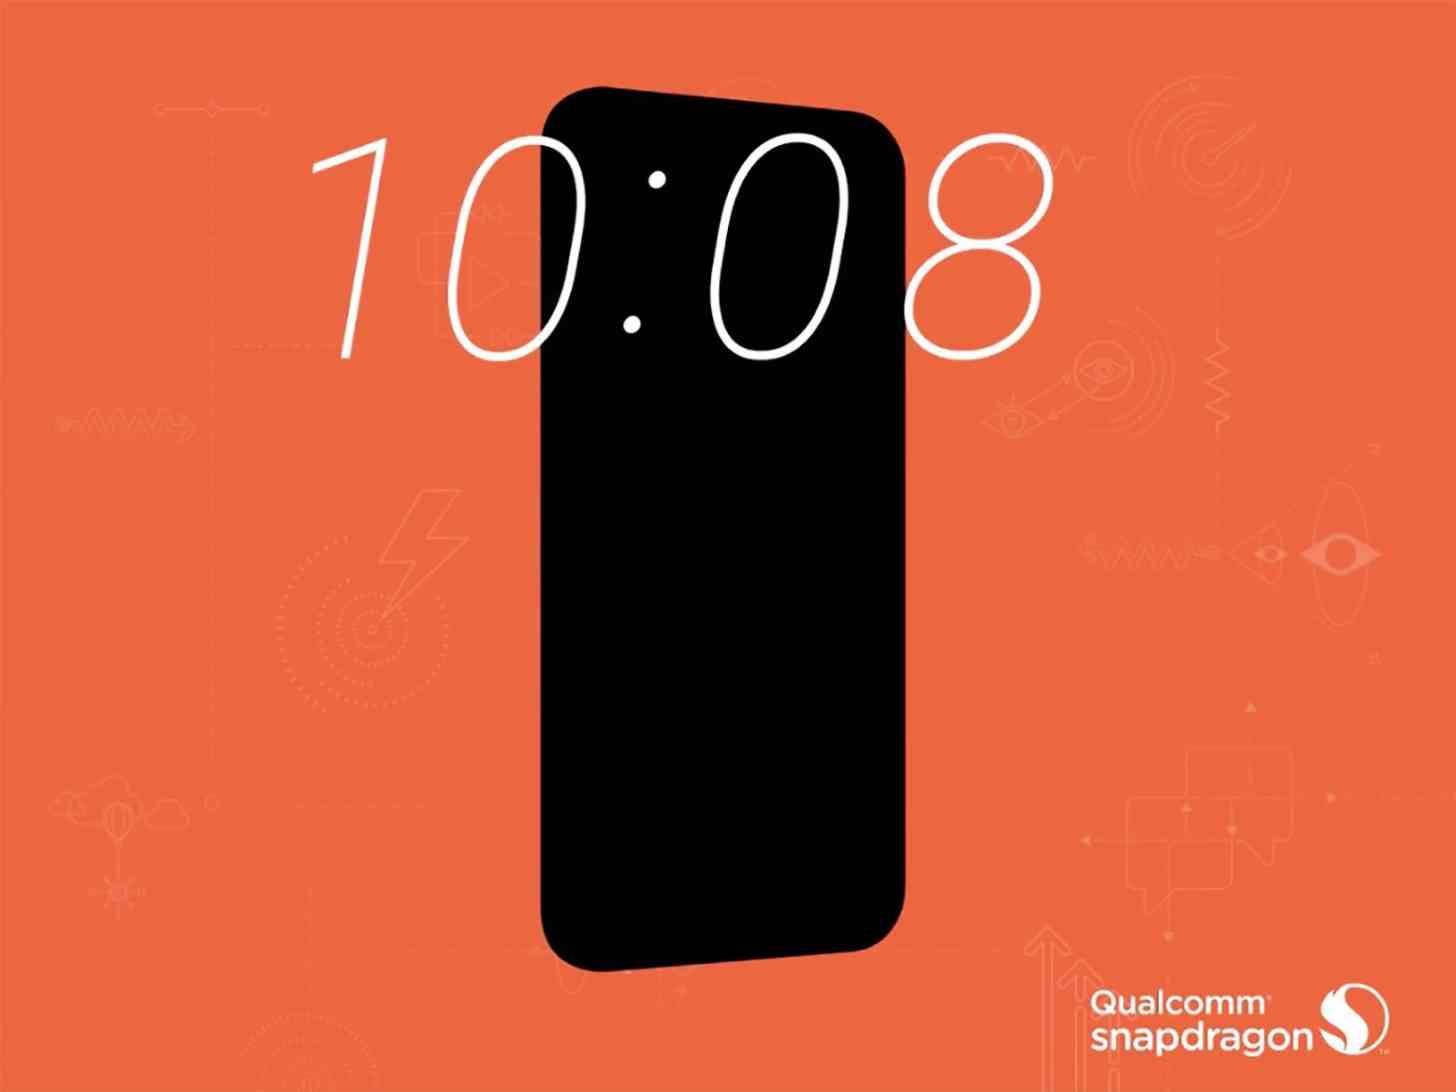 HTC One M9 Snapdragon 810 Qualcomm teaser large